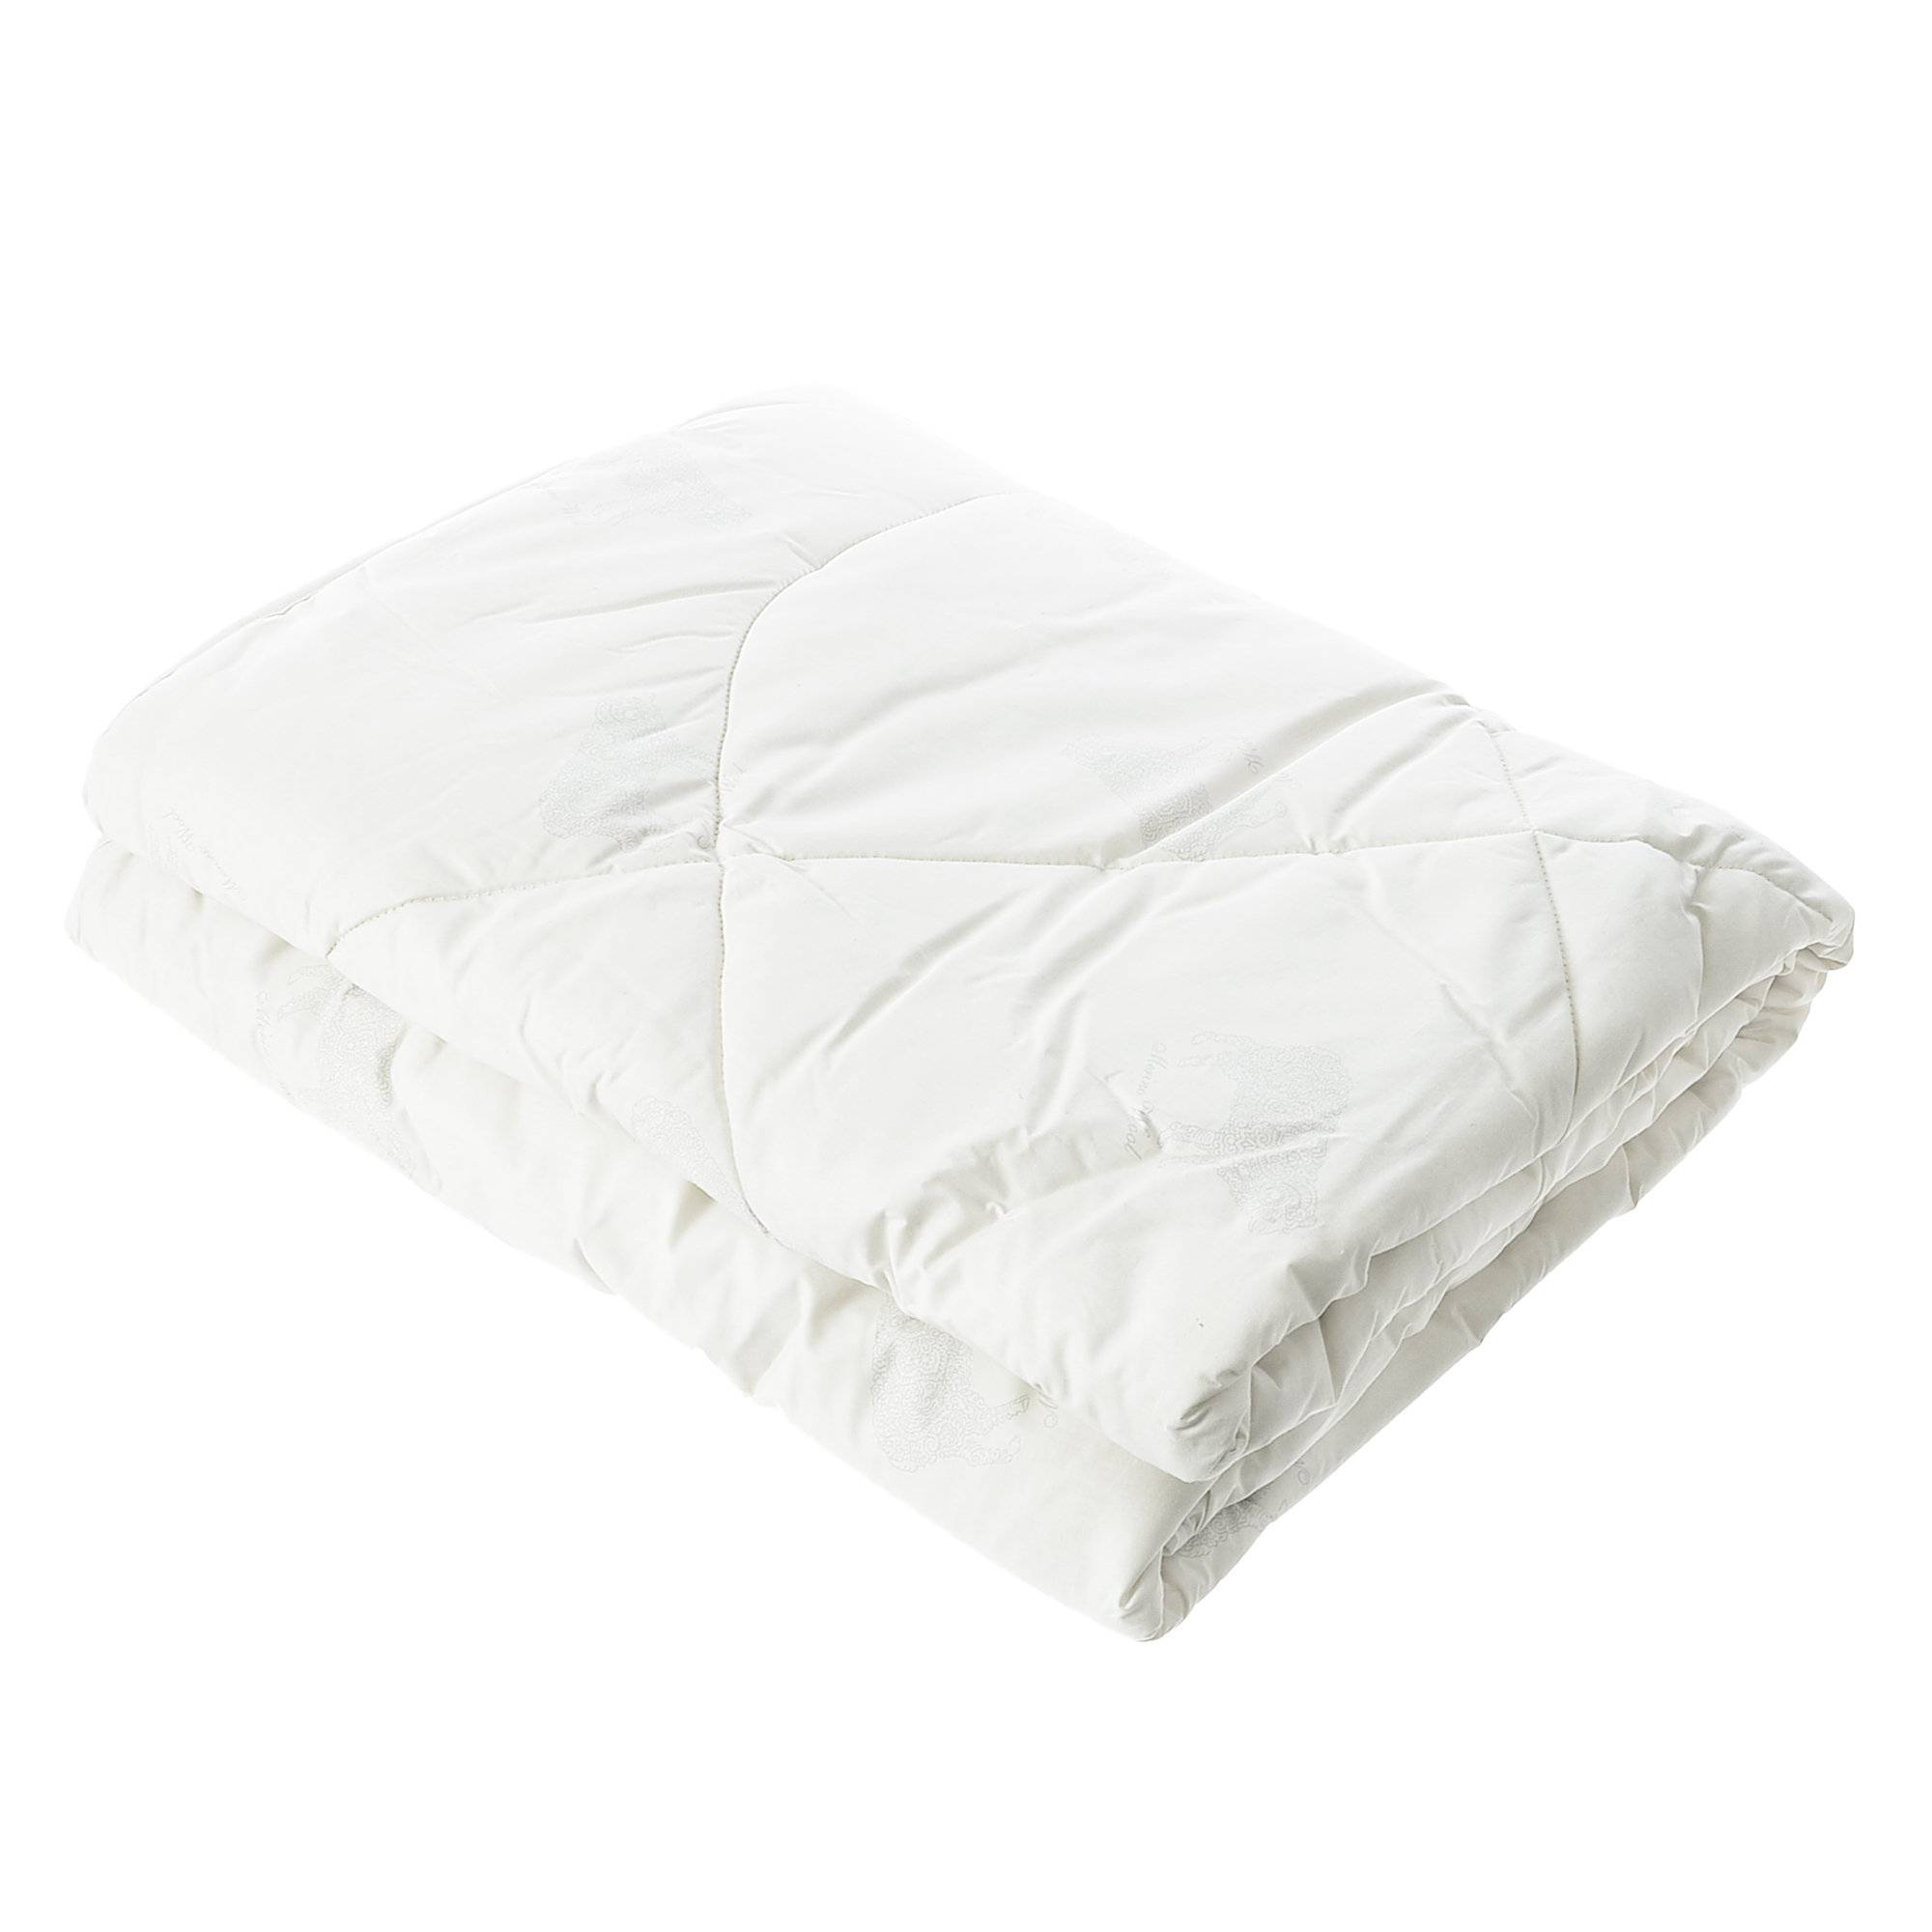 Фото - Одеяло Classic by togas мерино 140х200 одеяло 1 5 спальное classic by togas пуше серое 140х200 см